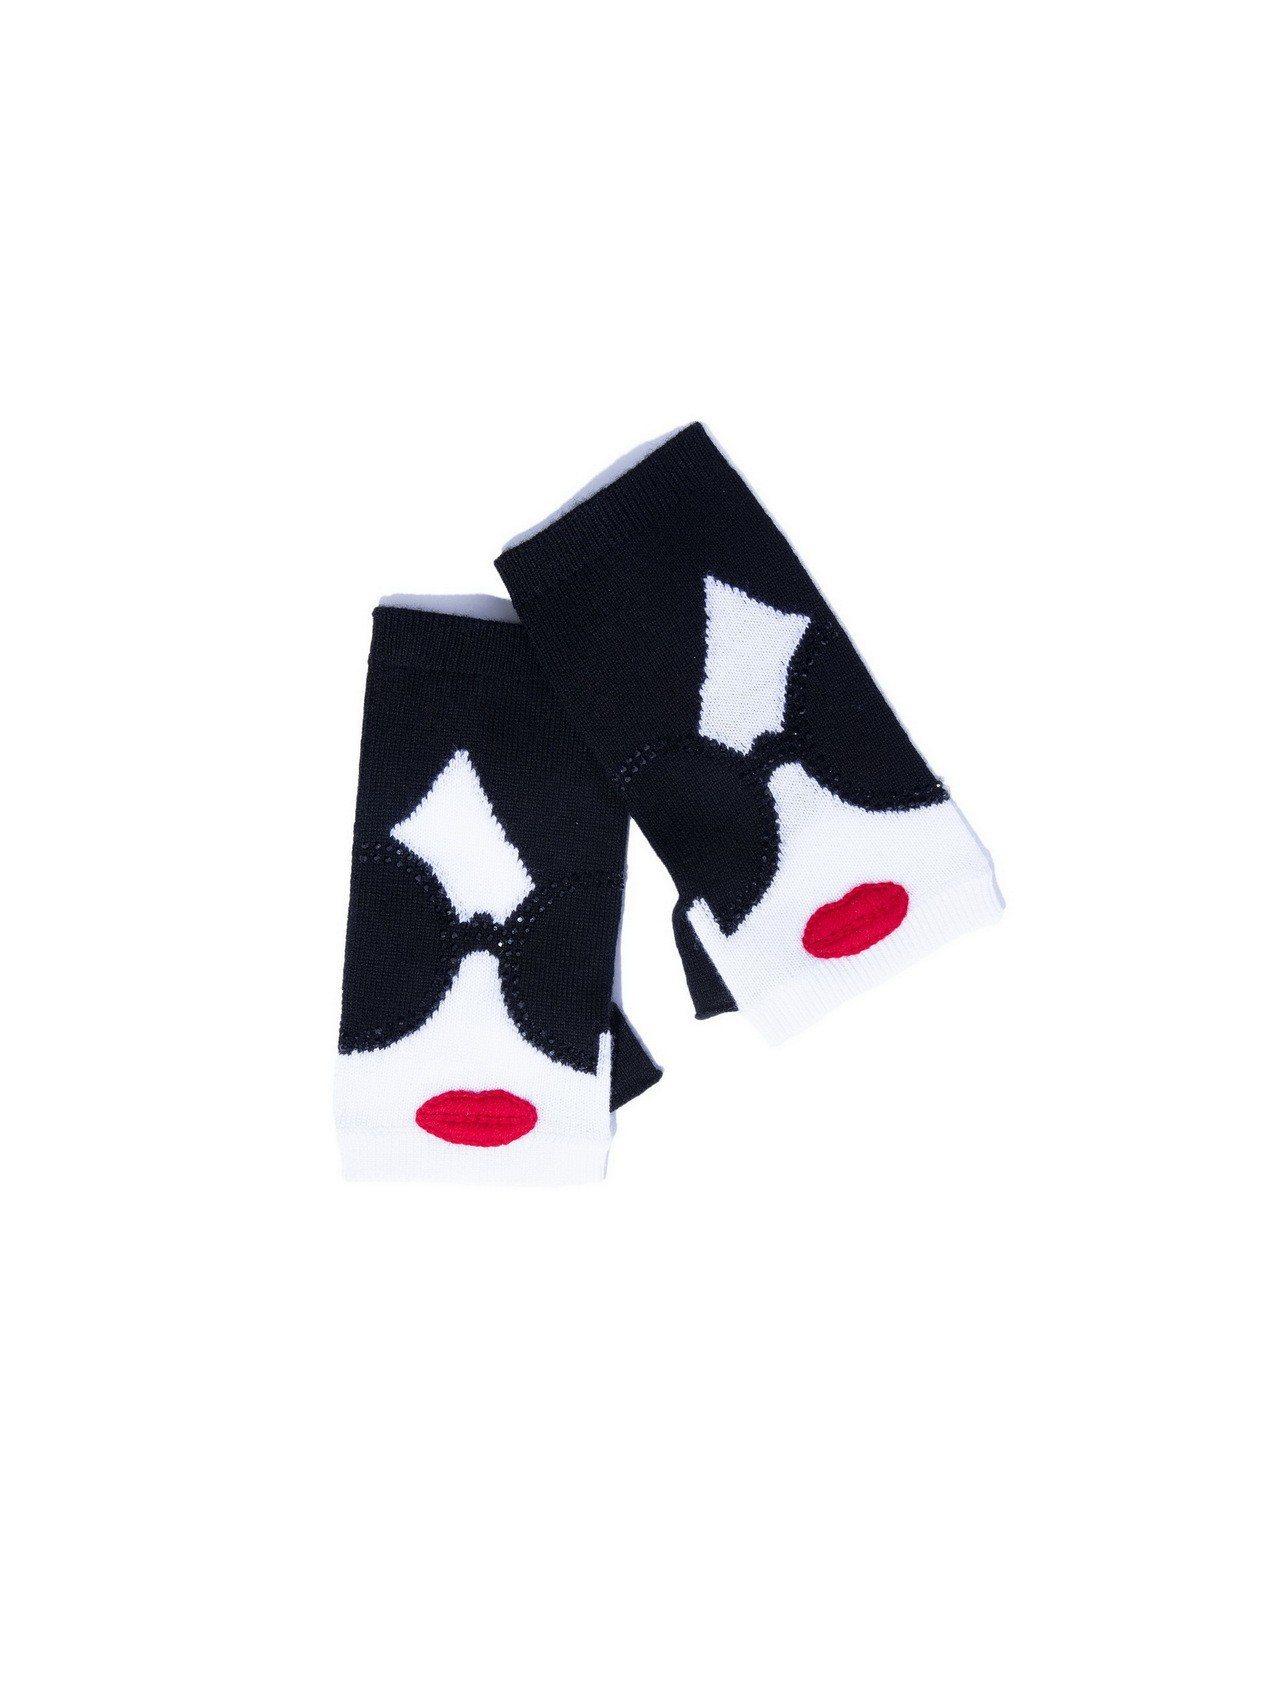 Stace Face露指手套,6,300元。圖/Alice+Olivia提供